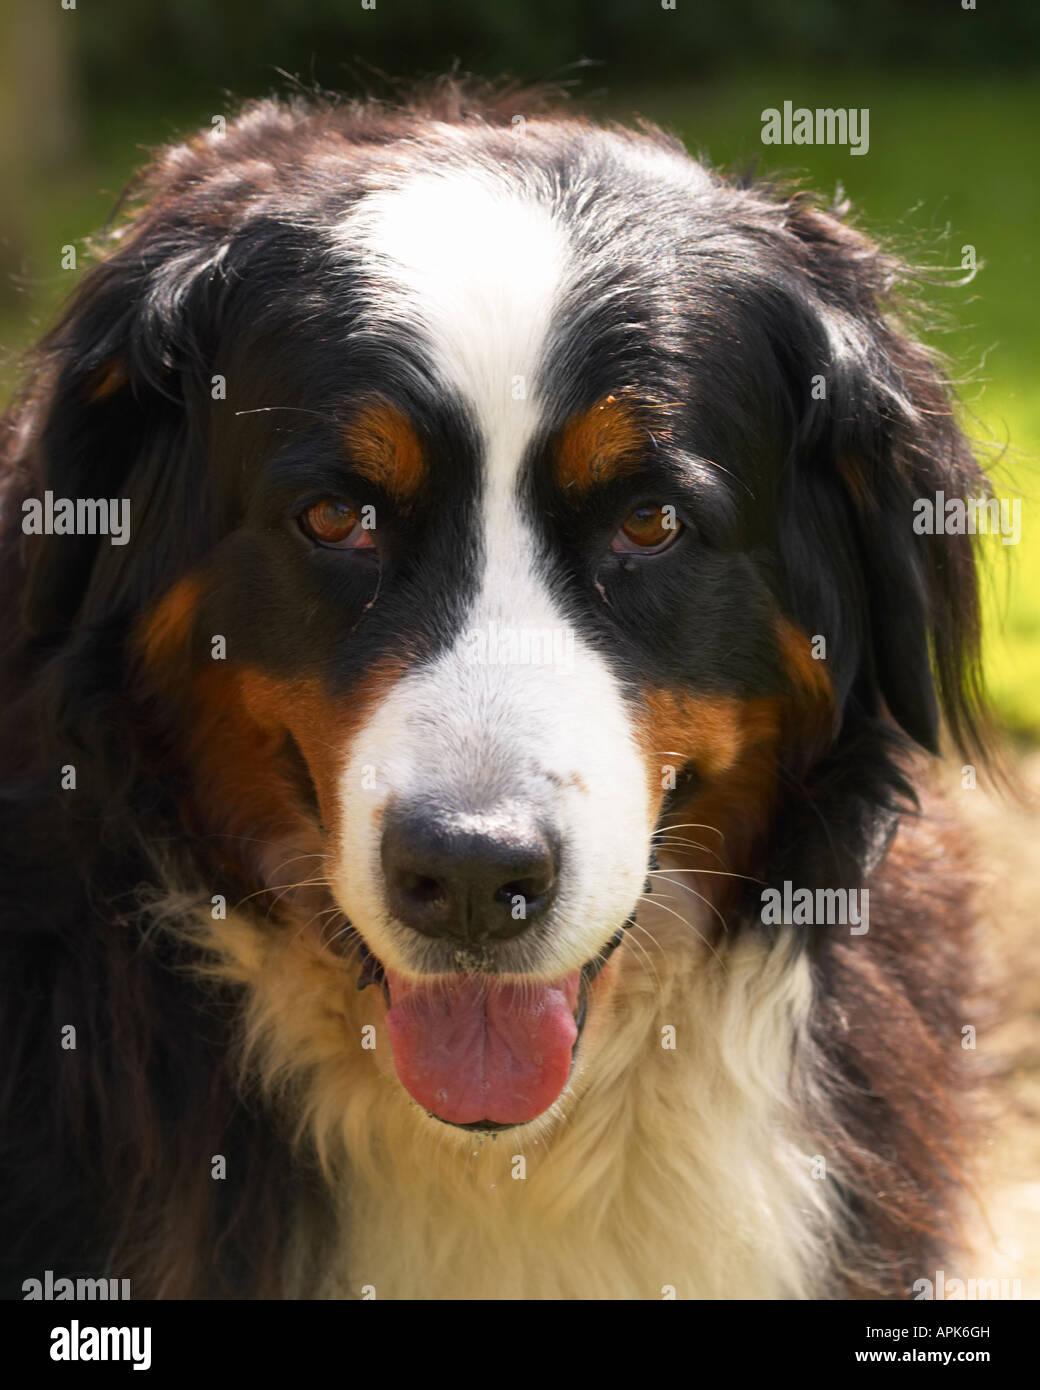 burmese mountain dog - Stock Image